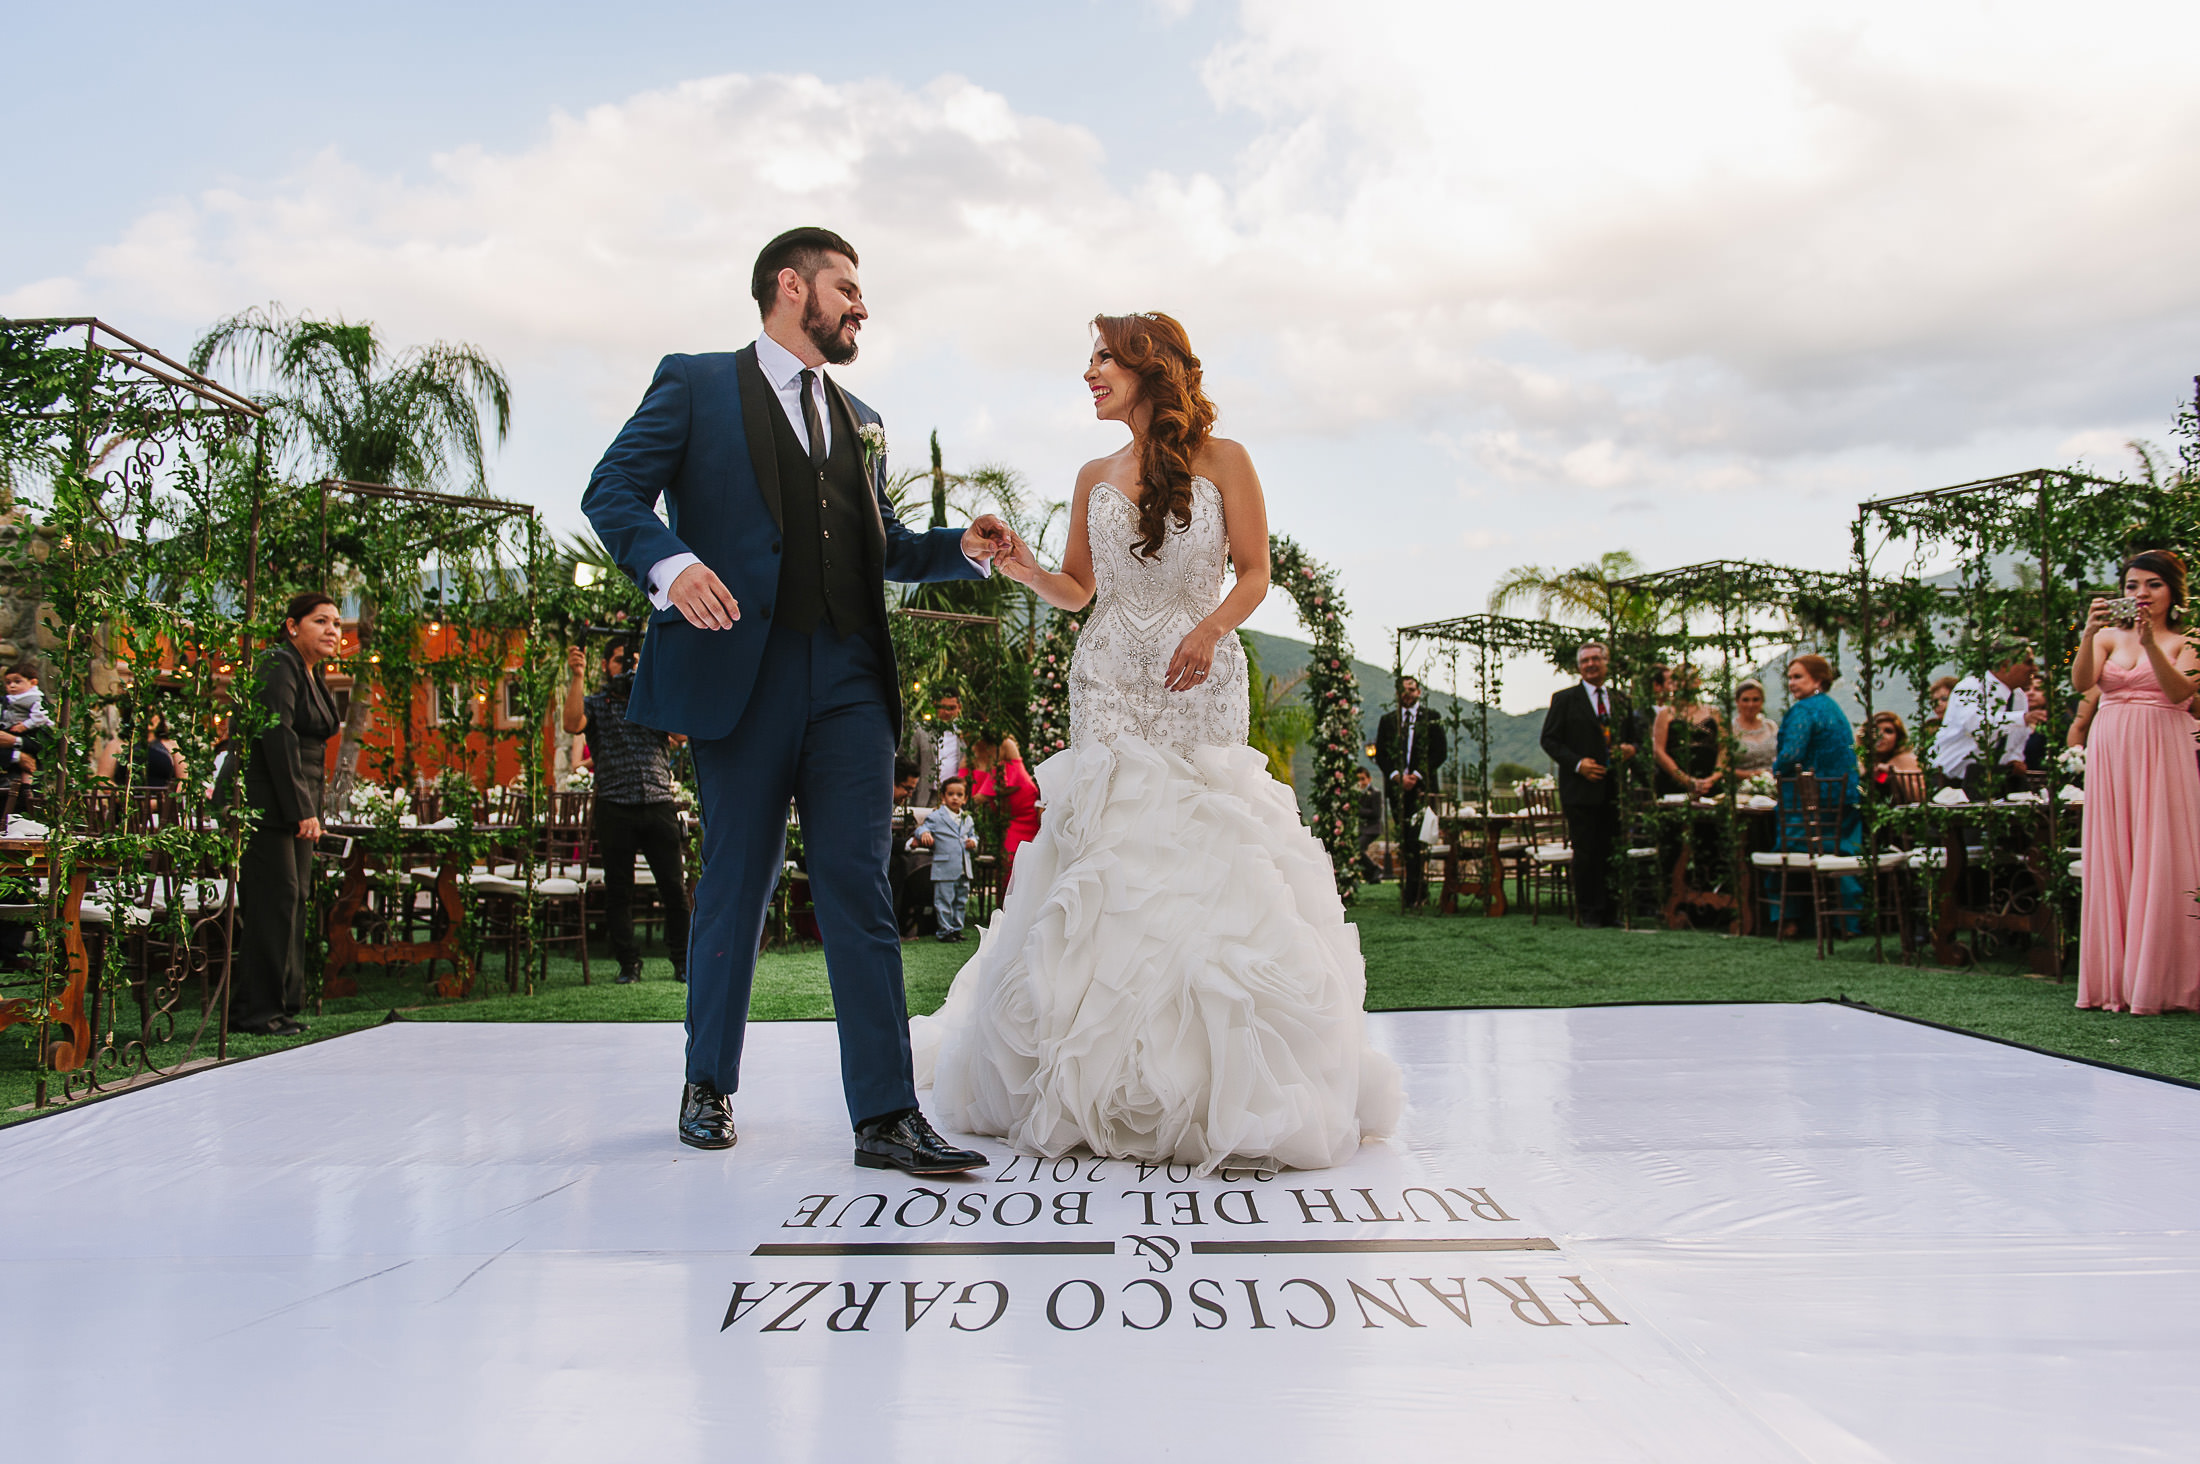 First dance Ruth & Paco wedding reception